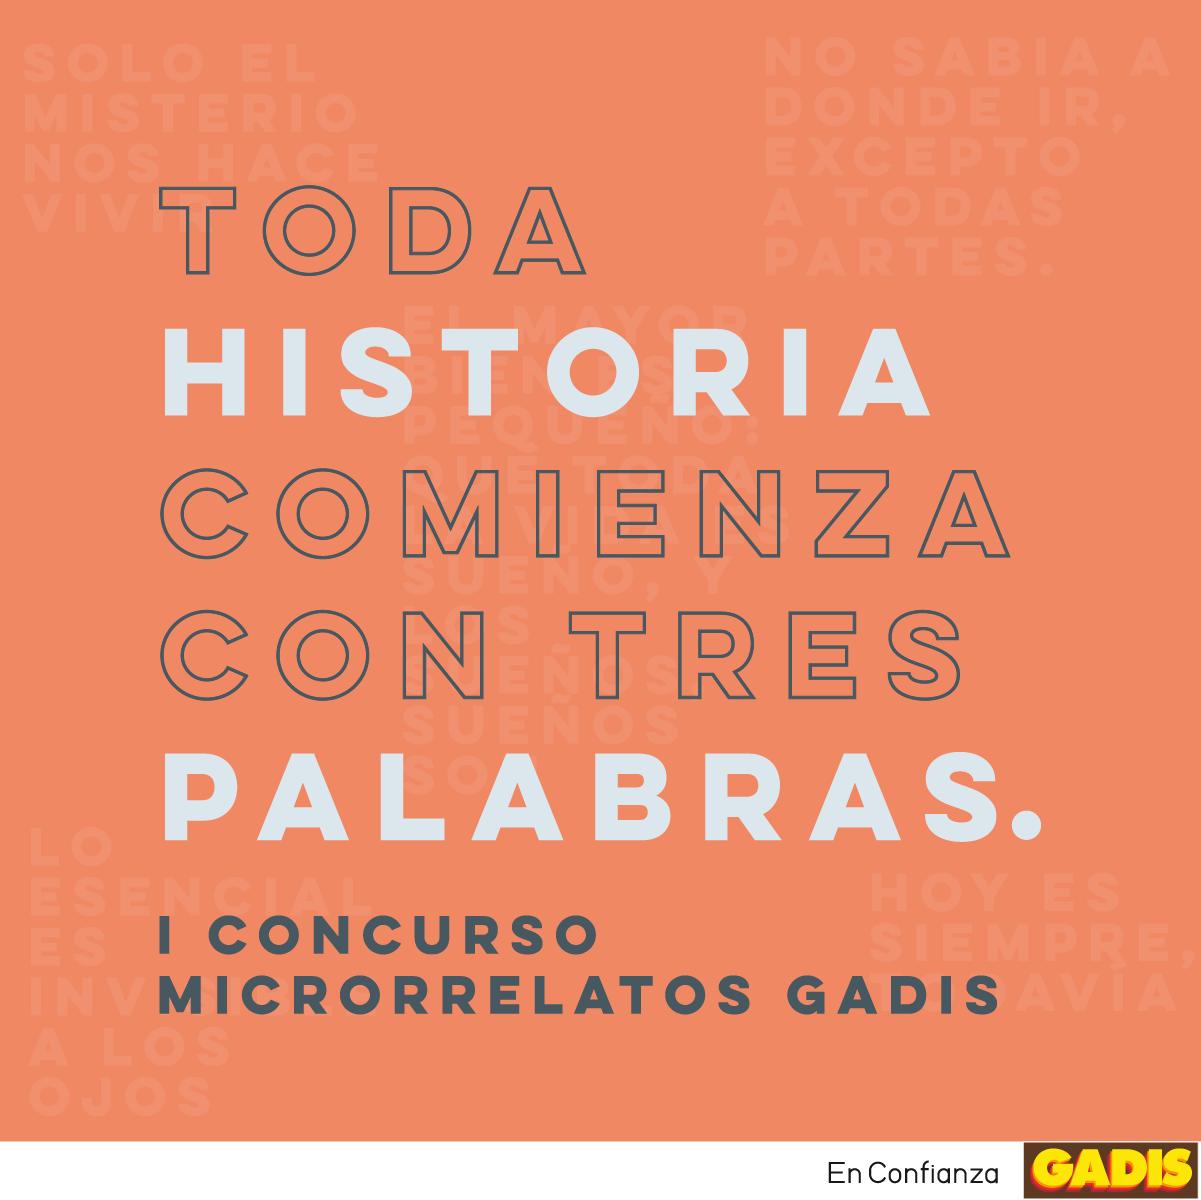 I CONCURSO MICRORRELATOS GADIS